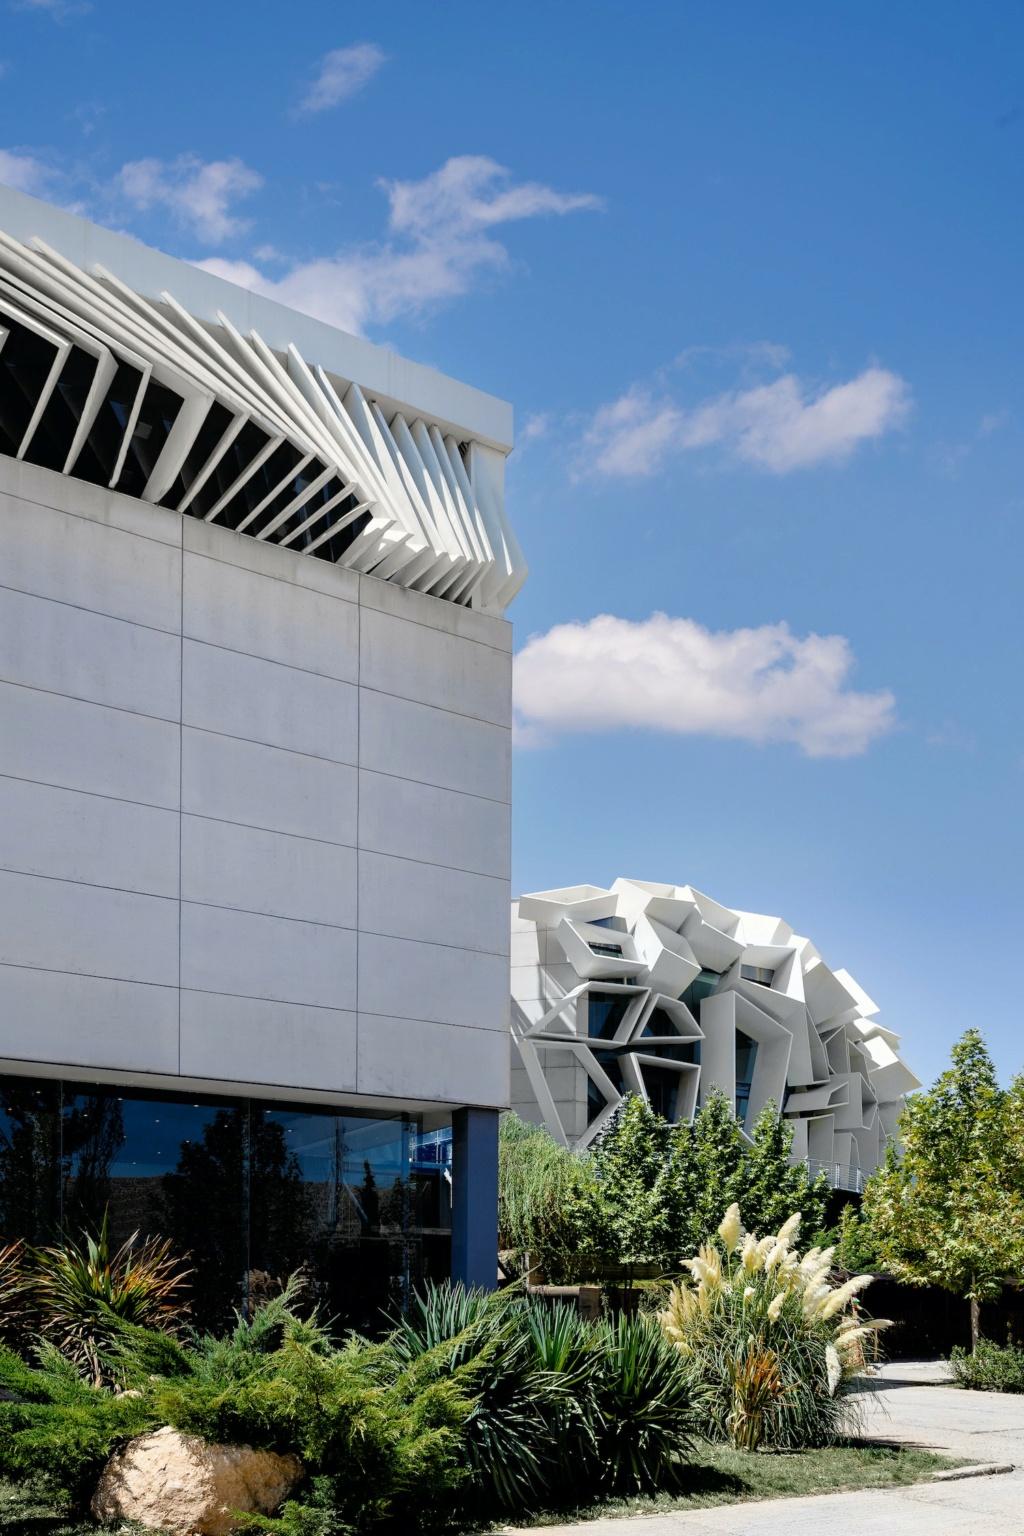 Centre d'exposition Greenland - Sadra - Iran Zzzz60